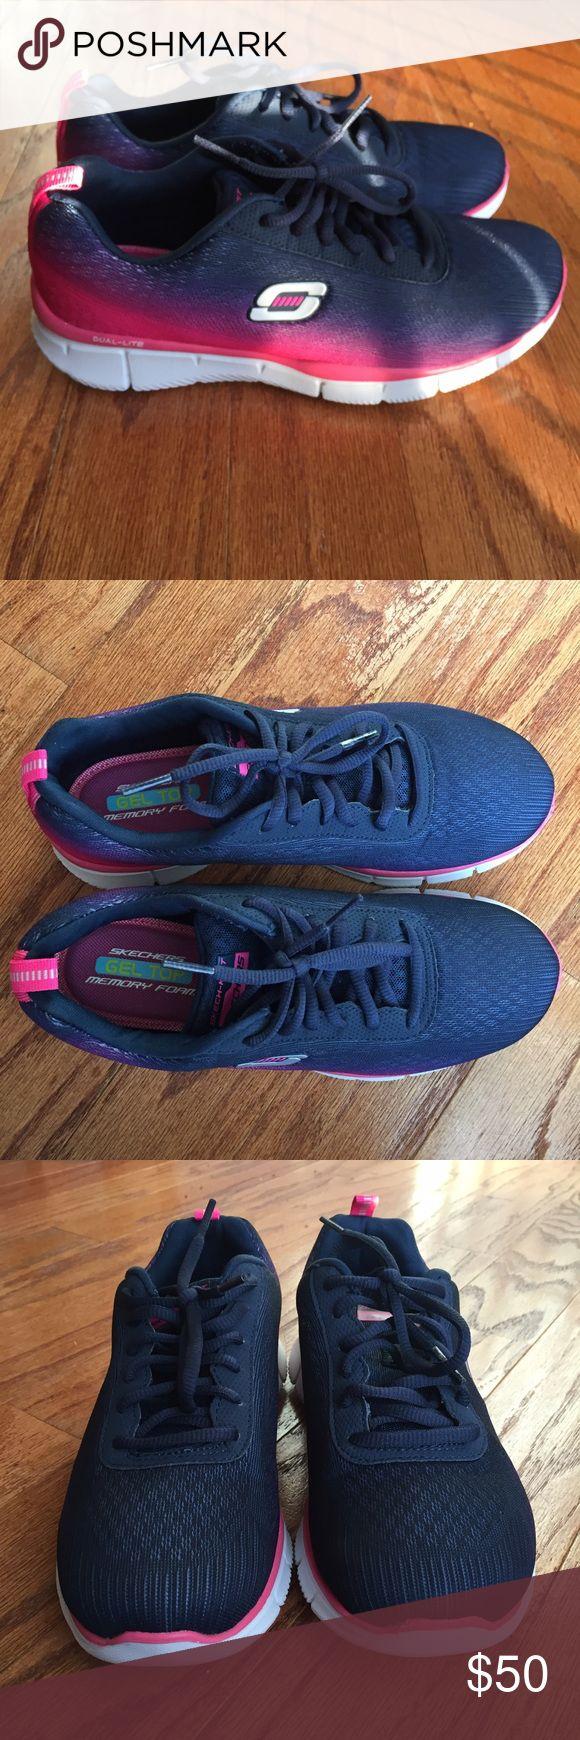 Women's Athletic Shoes Brand new gradient Skechers! Never worn before. Memory foam bottom, very comfortable!! Skechers Shoes Athletic Shoes